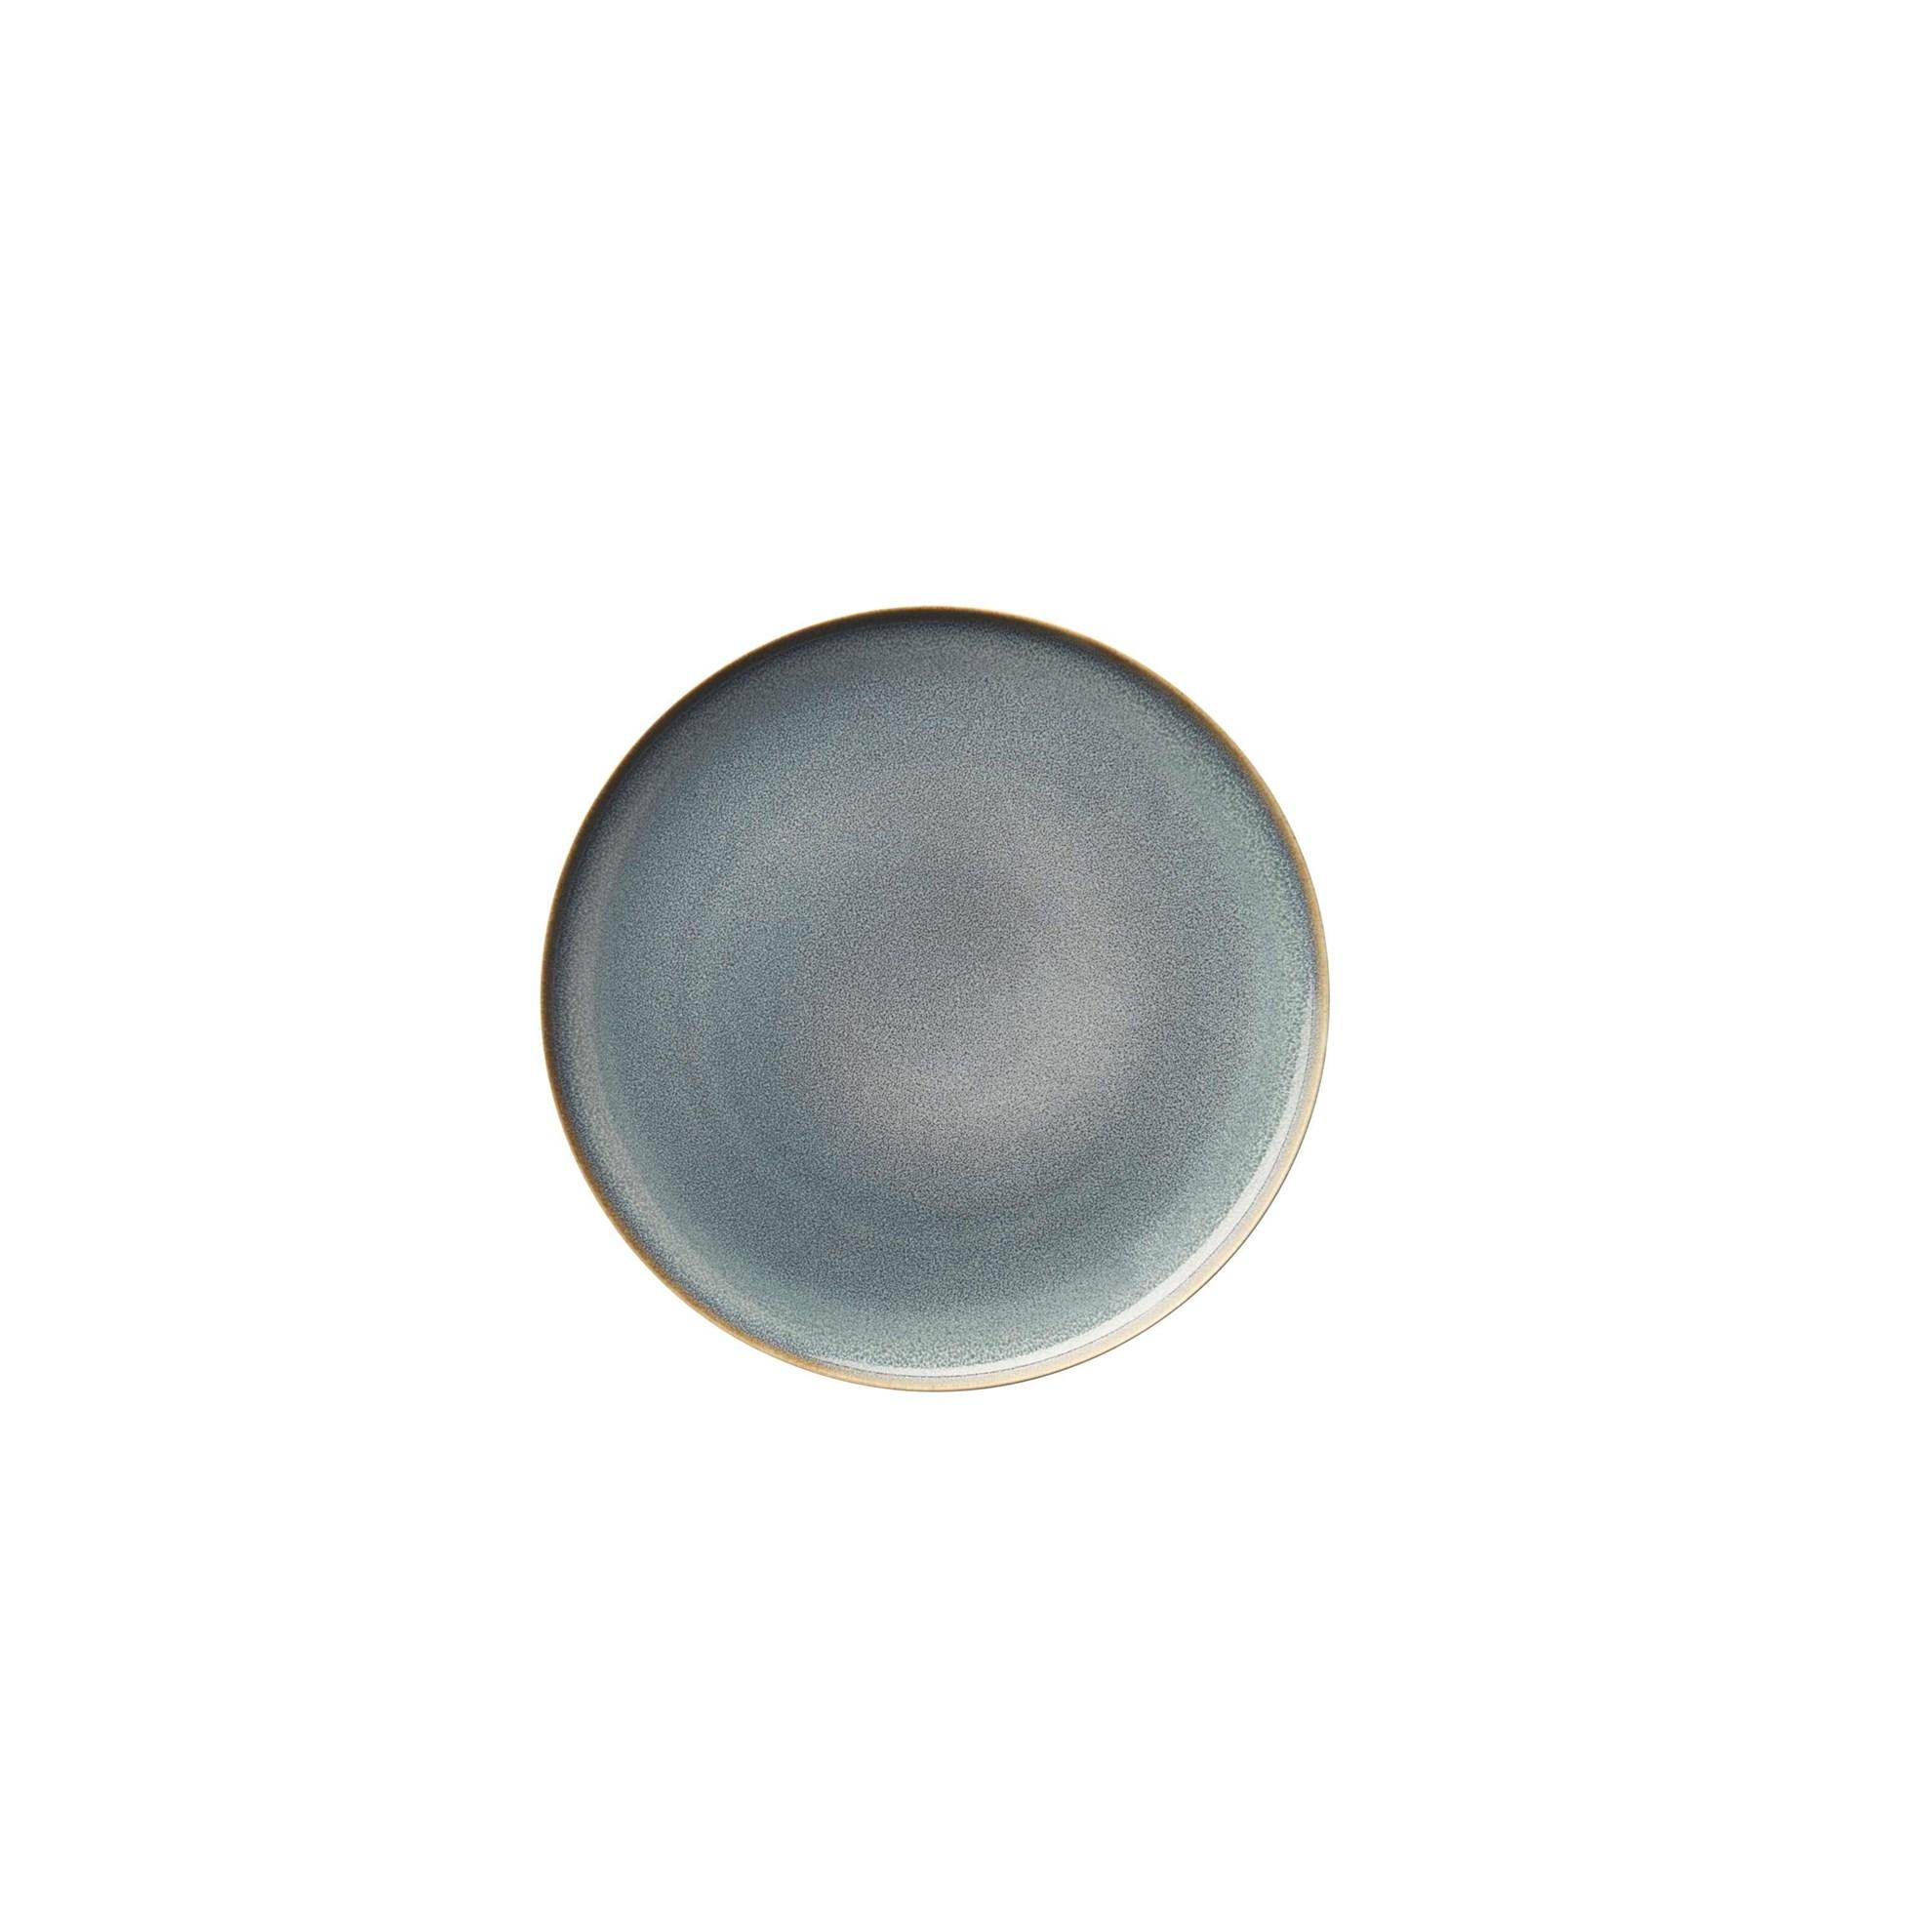 Dezertní talíř SAISONS 21 cm denim_0